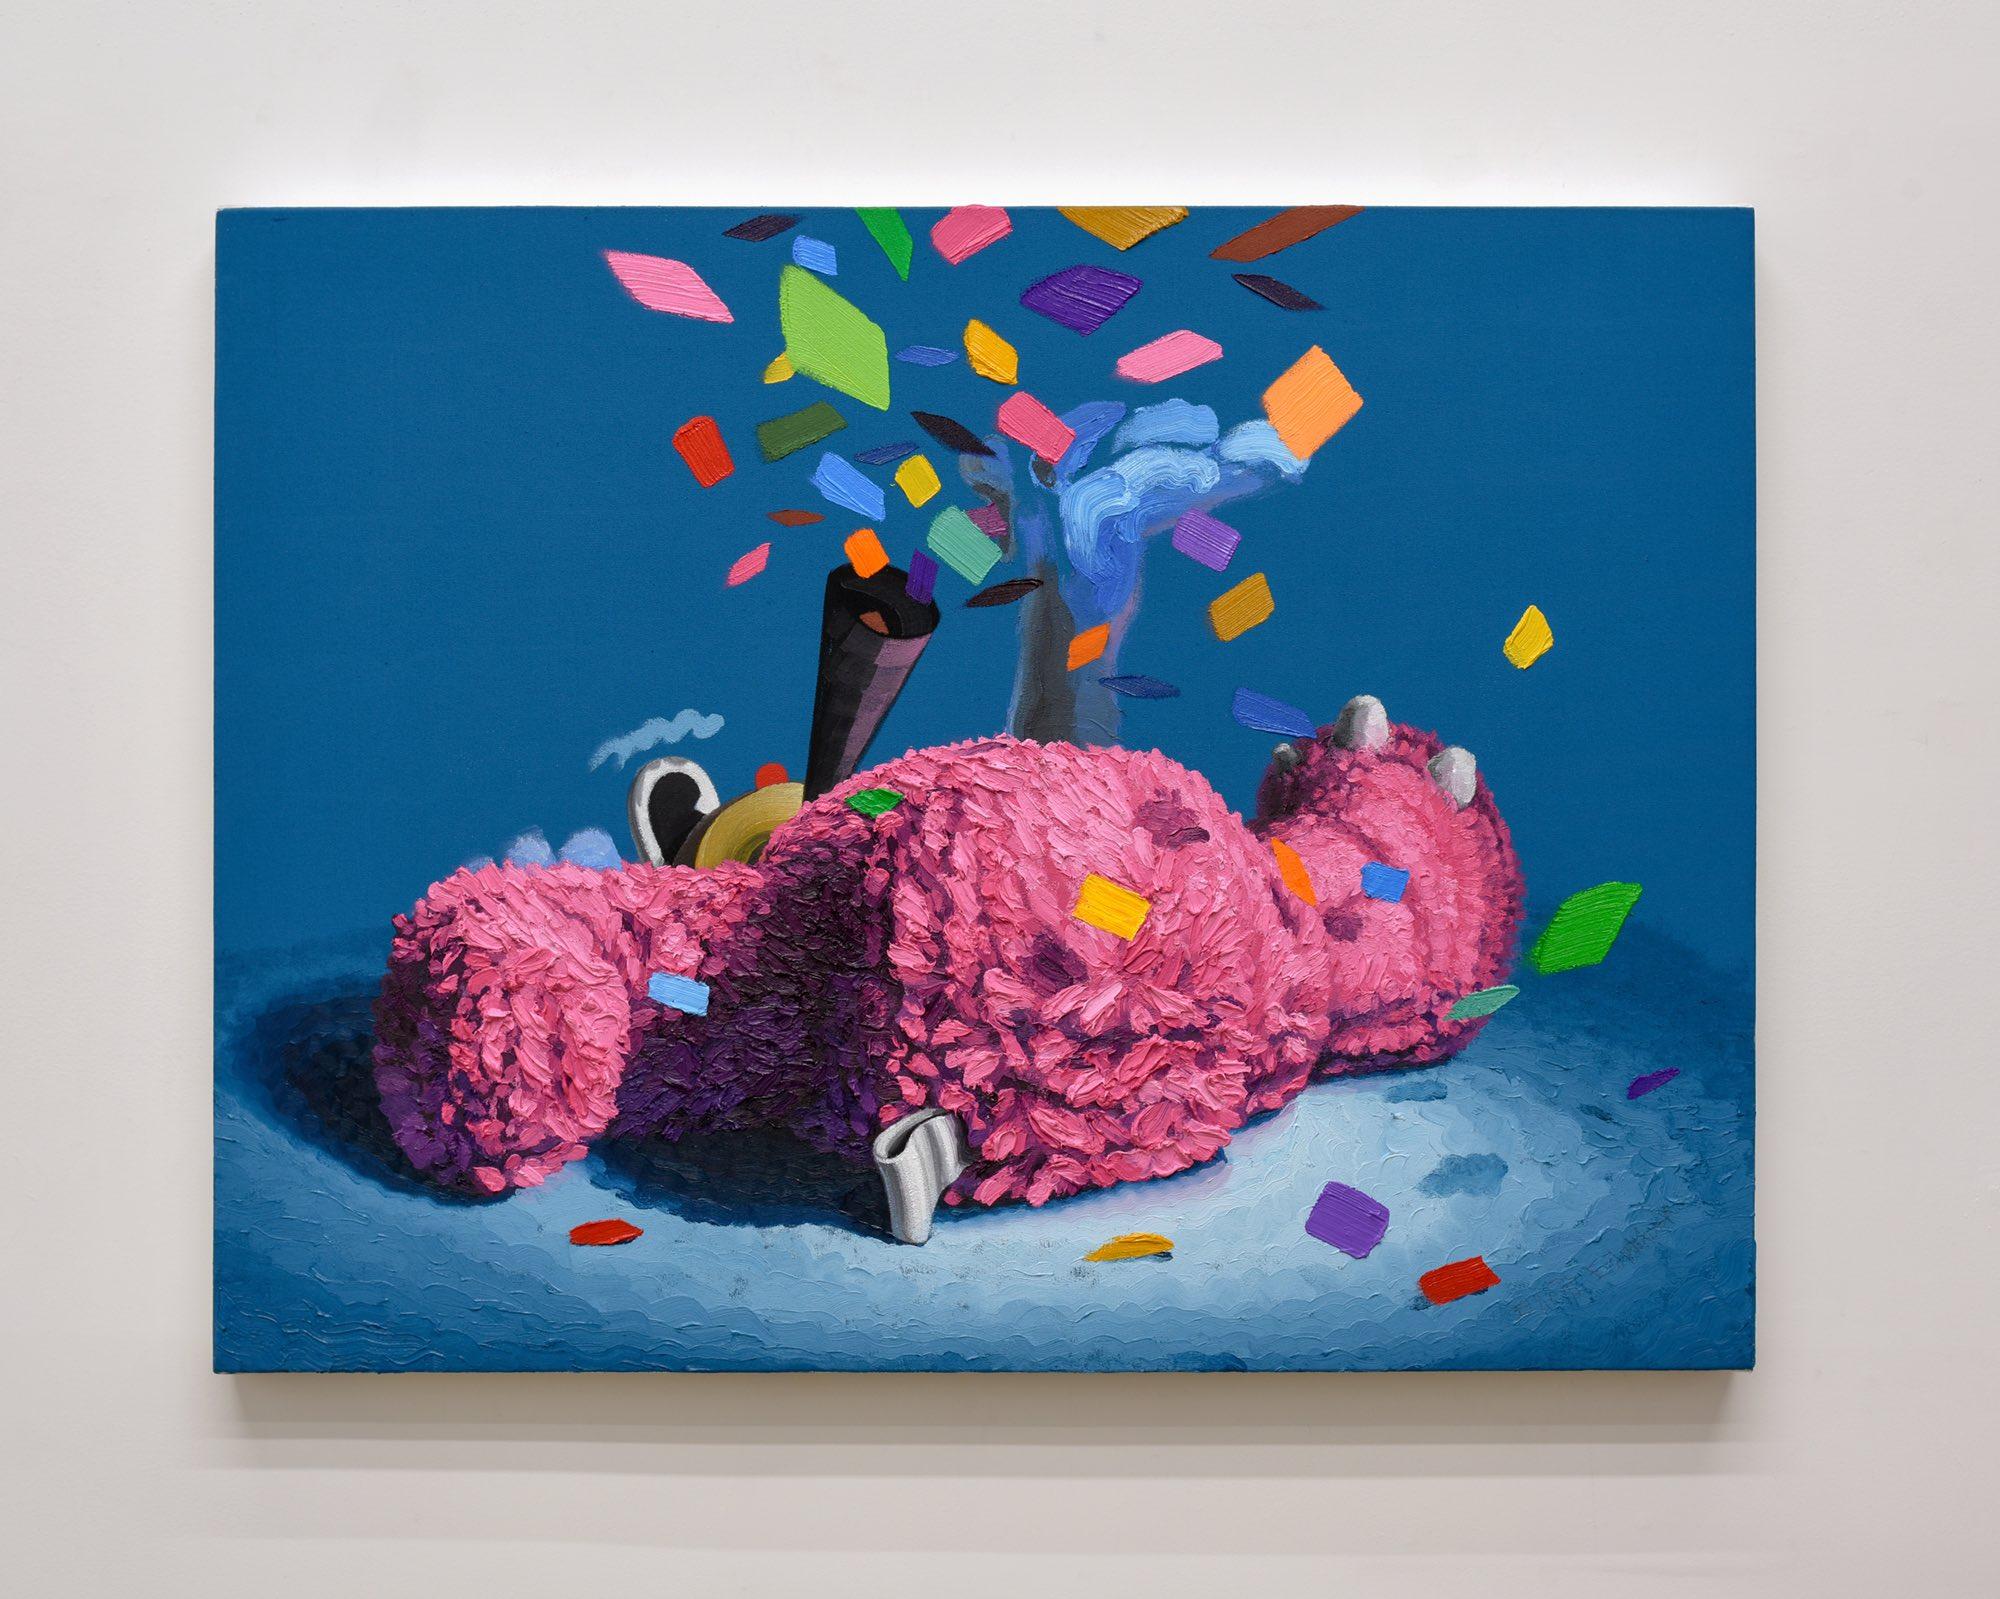 """third time's a charm"" oil on canvas, 30""x40"" (76cm x 102cm), 2018"